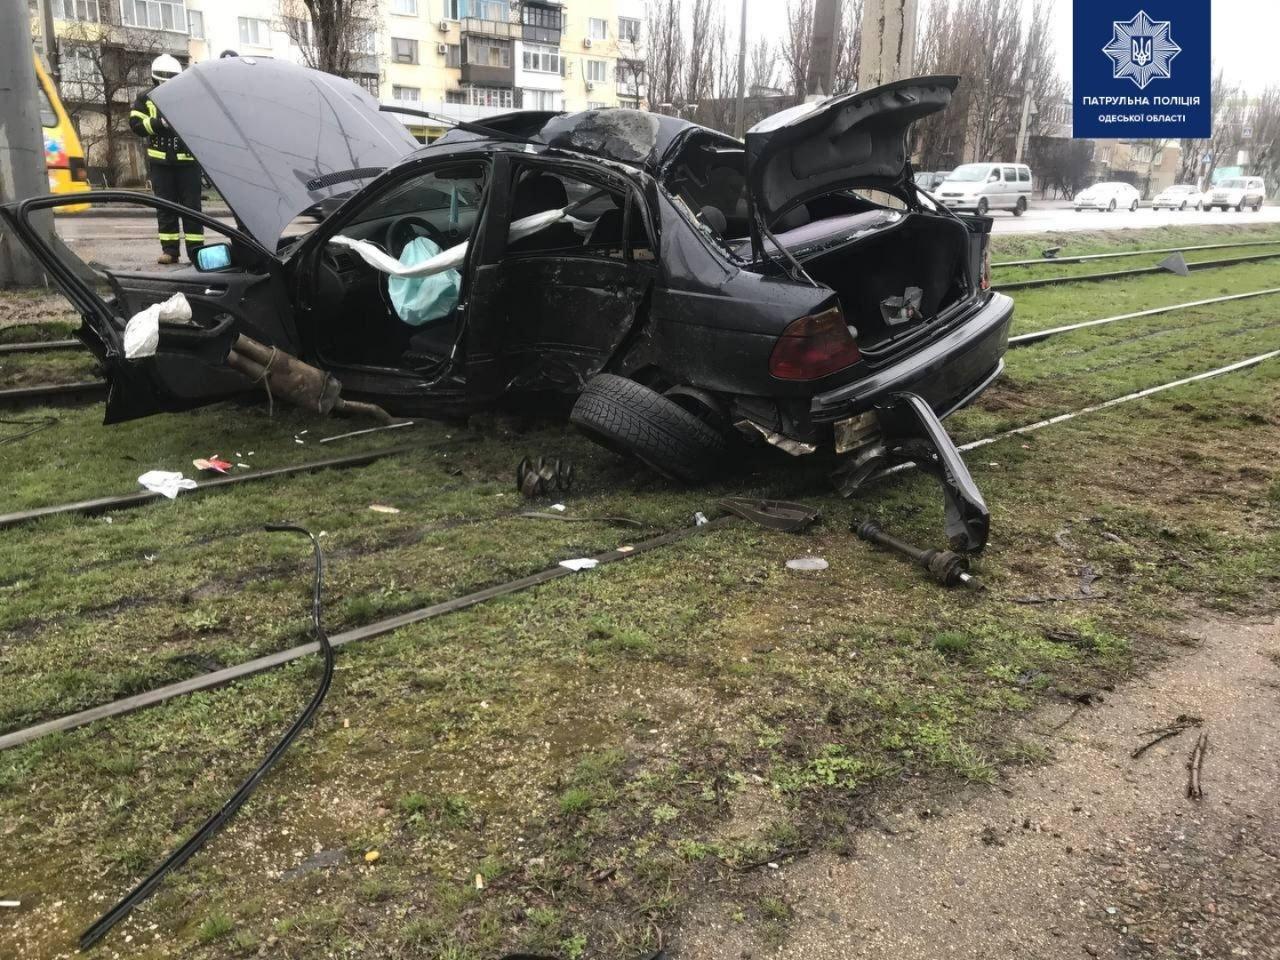 В Одессе на поселке машина влетела в столб , - ФОТО, фото-1